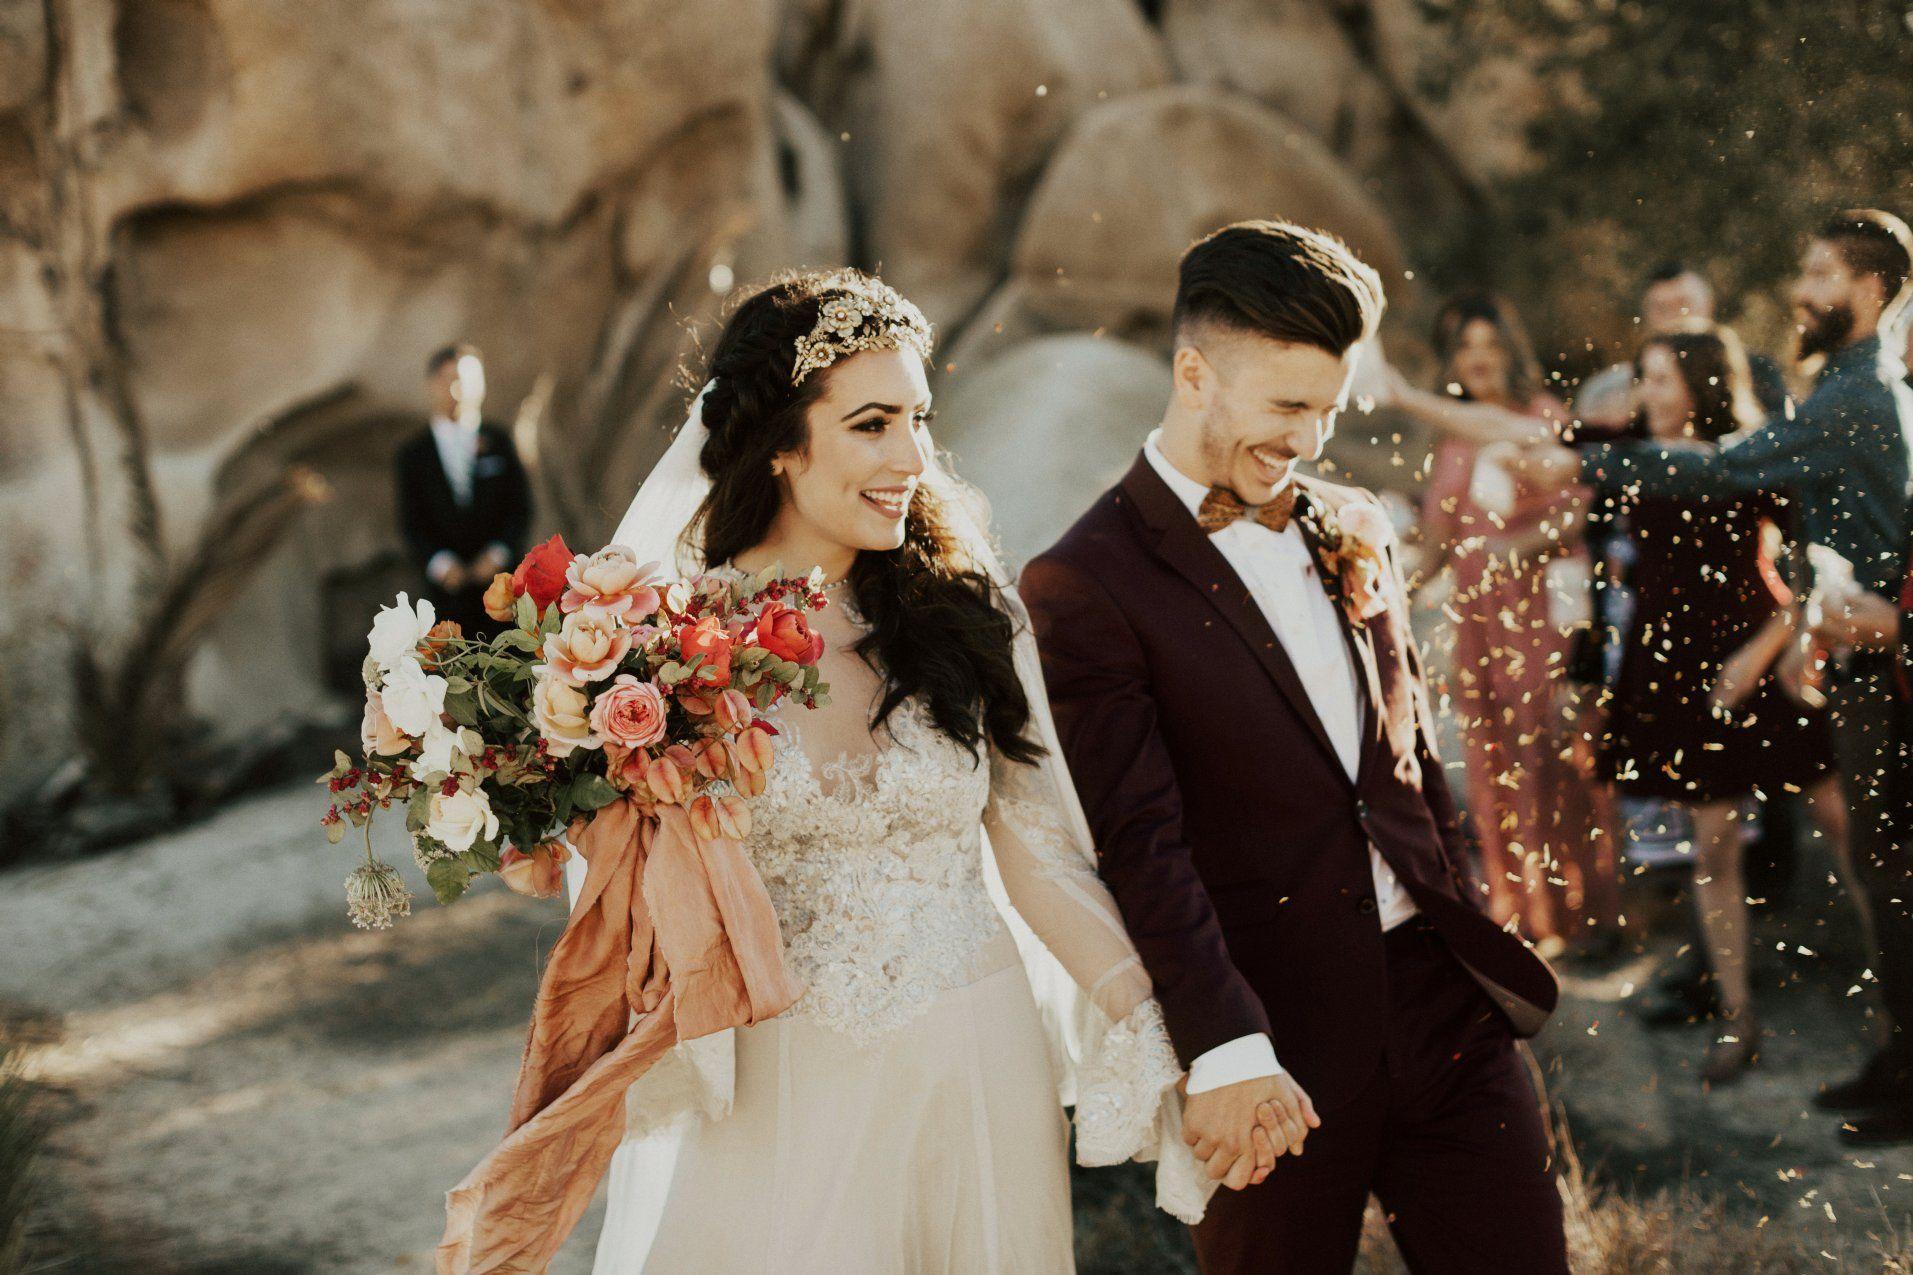 50 Best Wedding Photography Ideas - Most Beautiful Wedding Photos